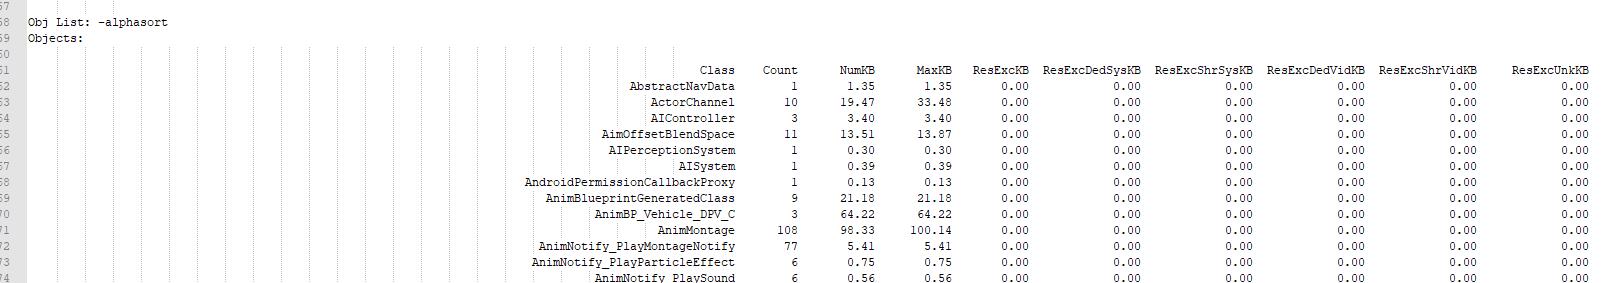 UE4导出内存分析和CPU分析报告